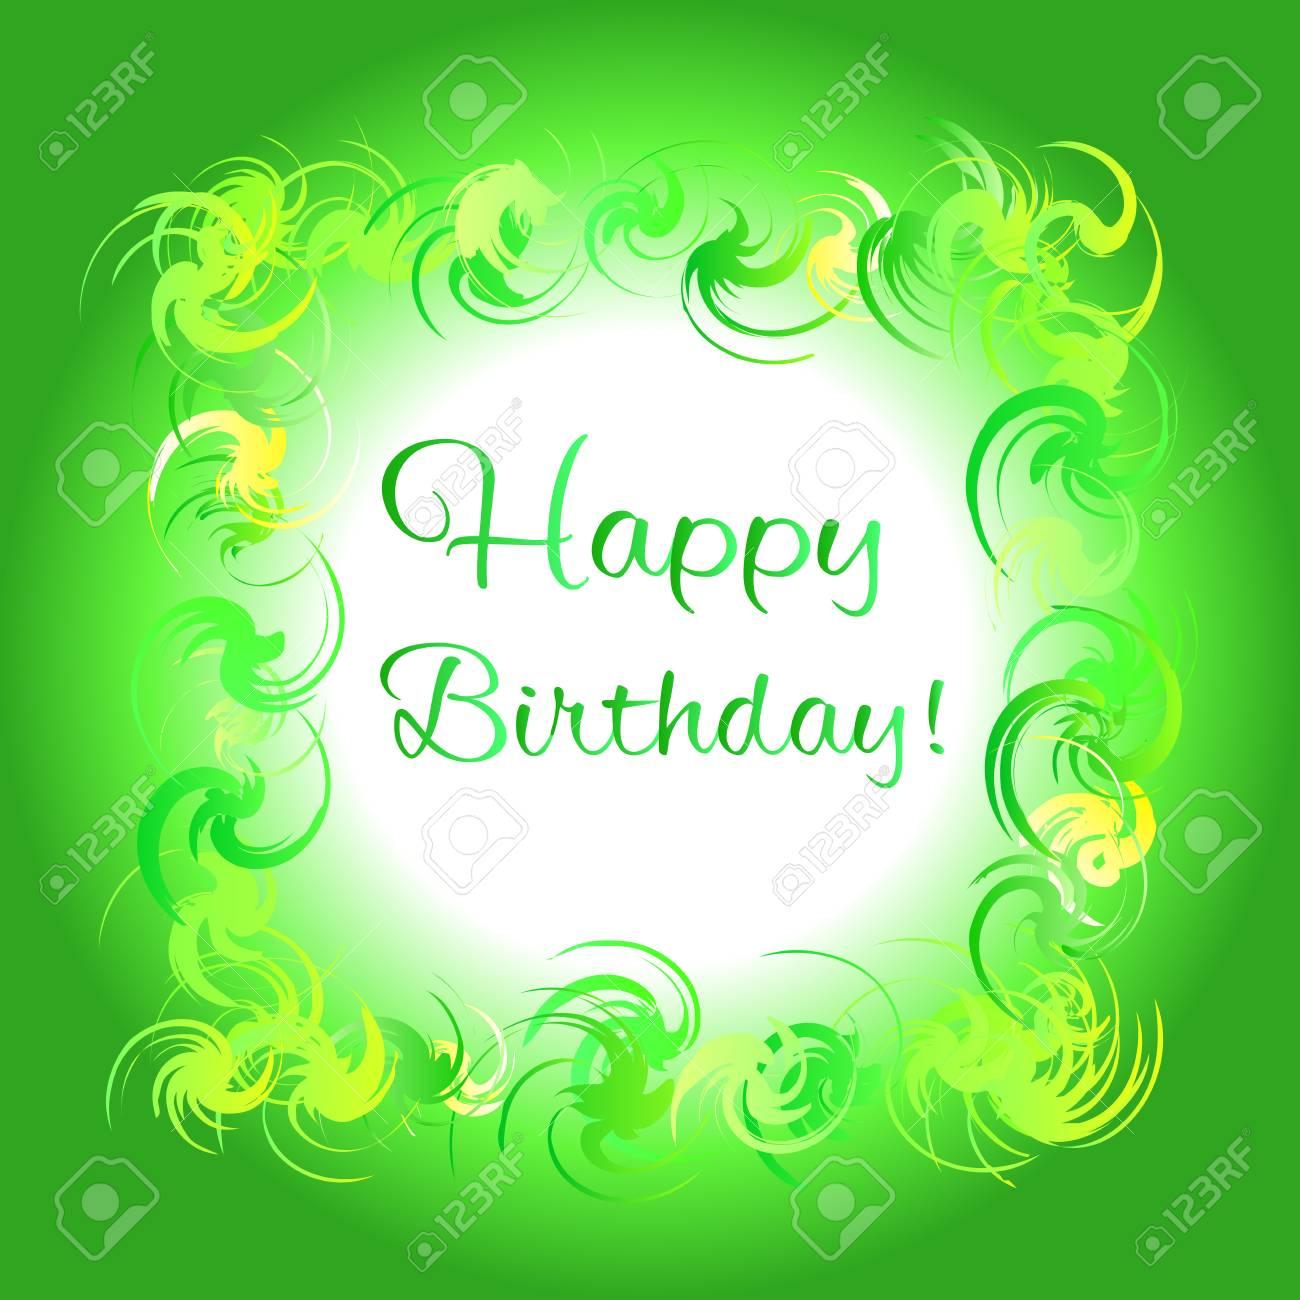 happy birthday in green - Isken kaptanband co